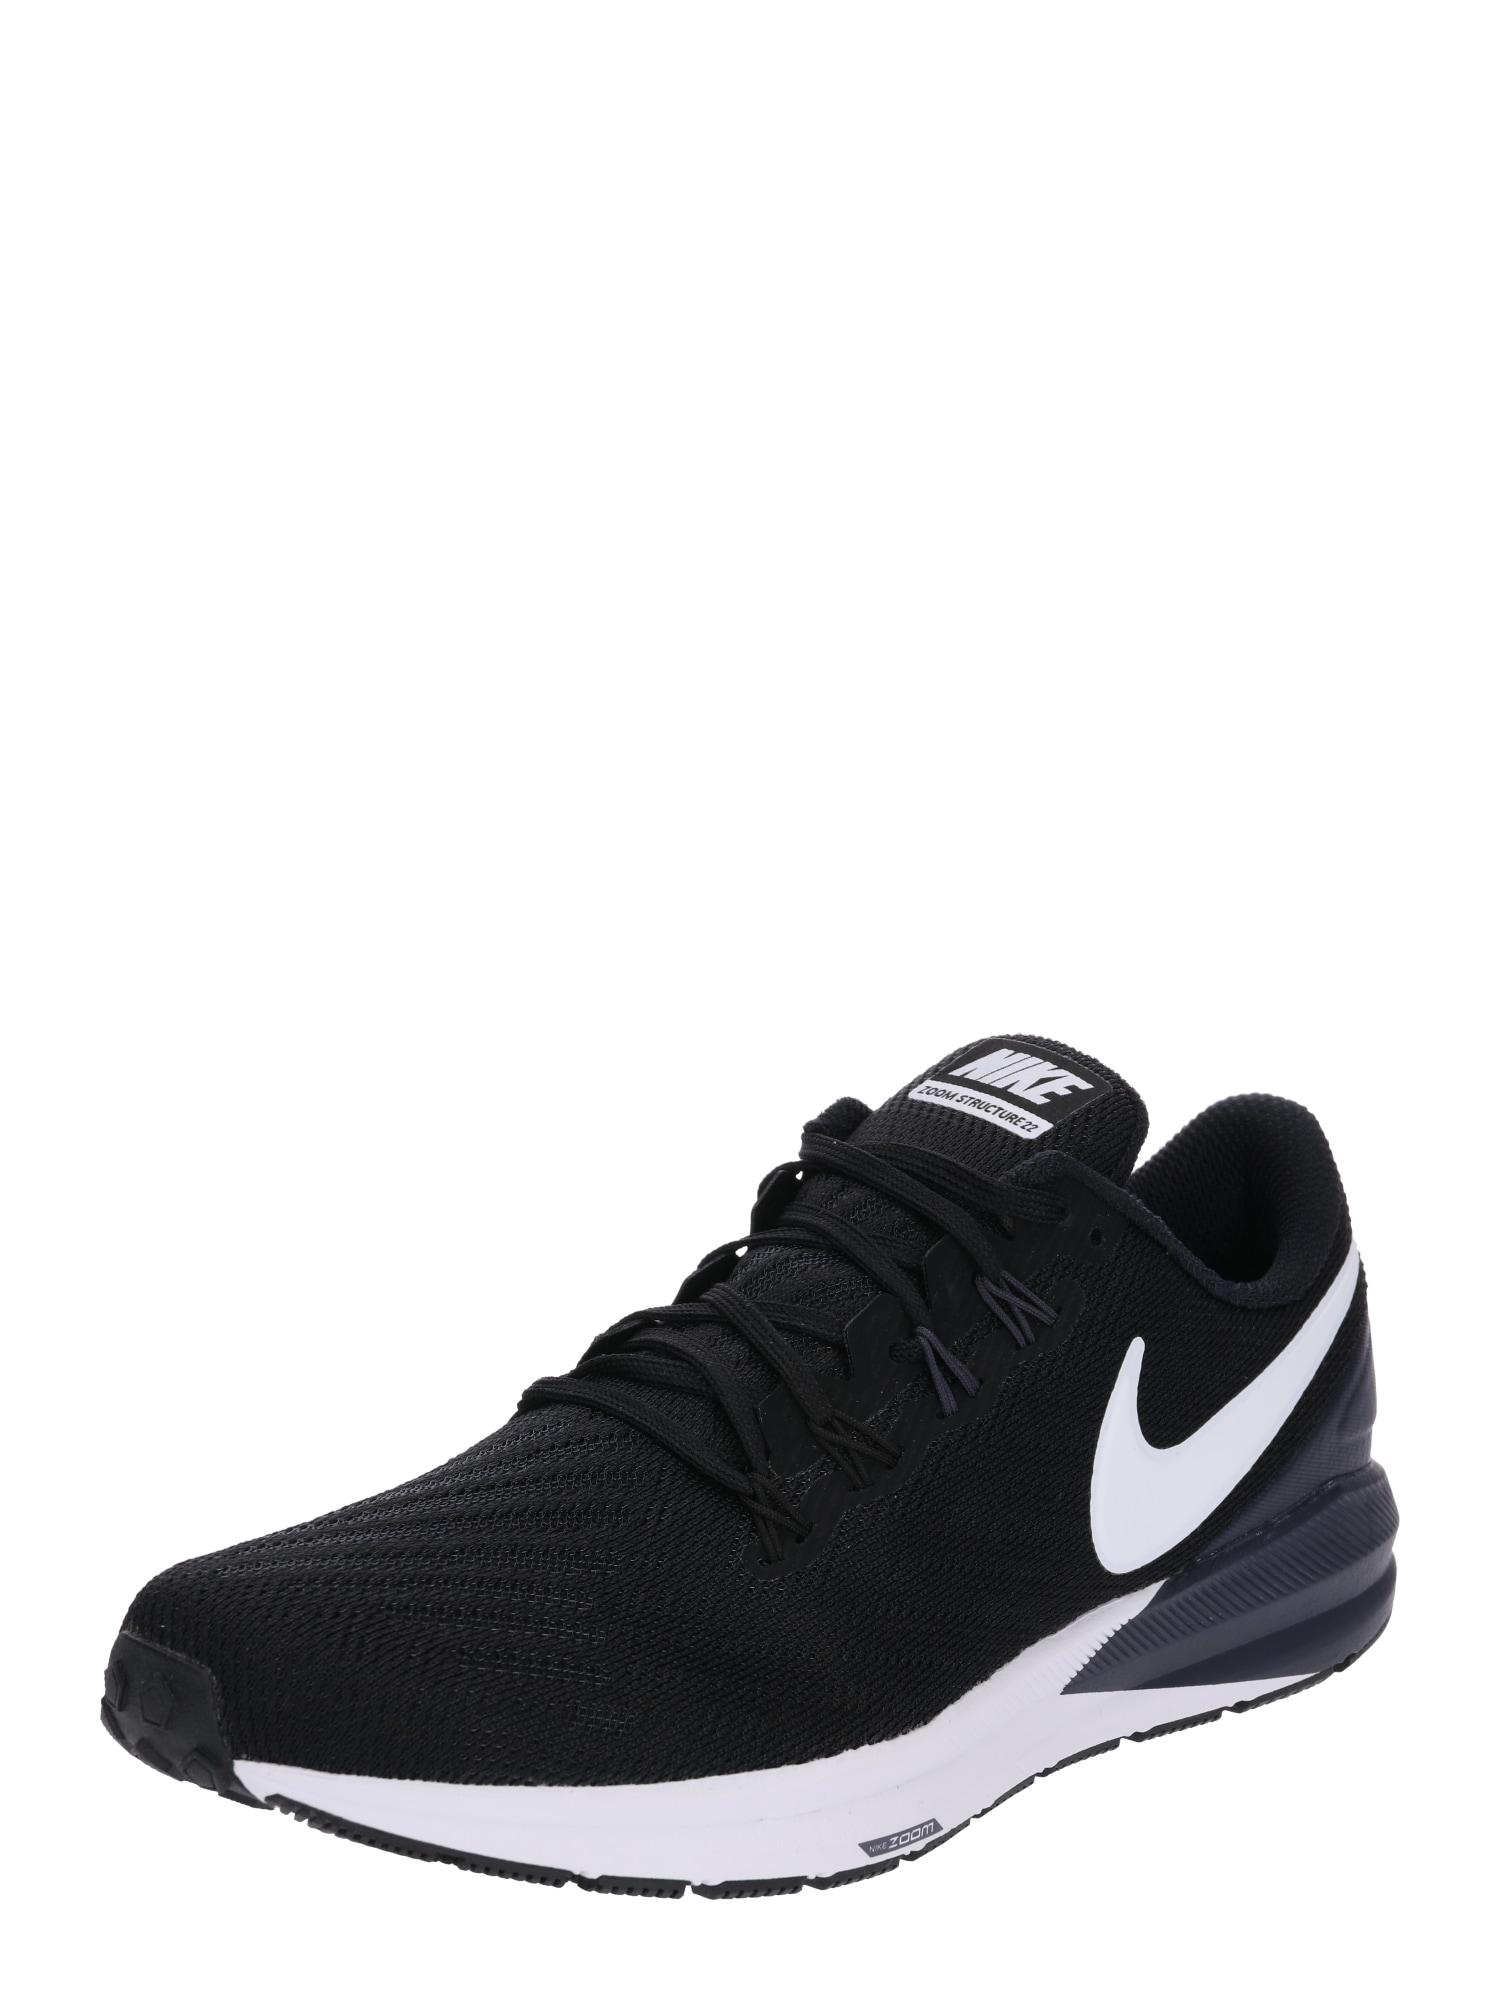 NIKE Bėgimo batai 'Air Zoom Structure 22' balta / juoda